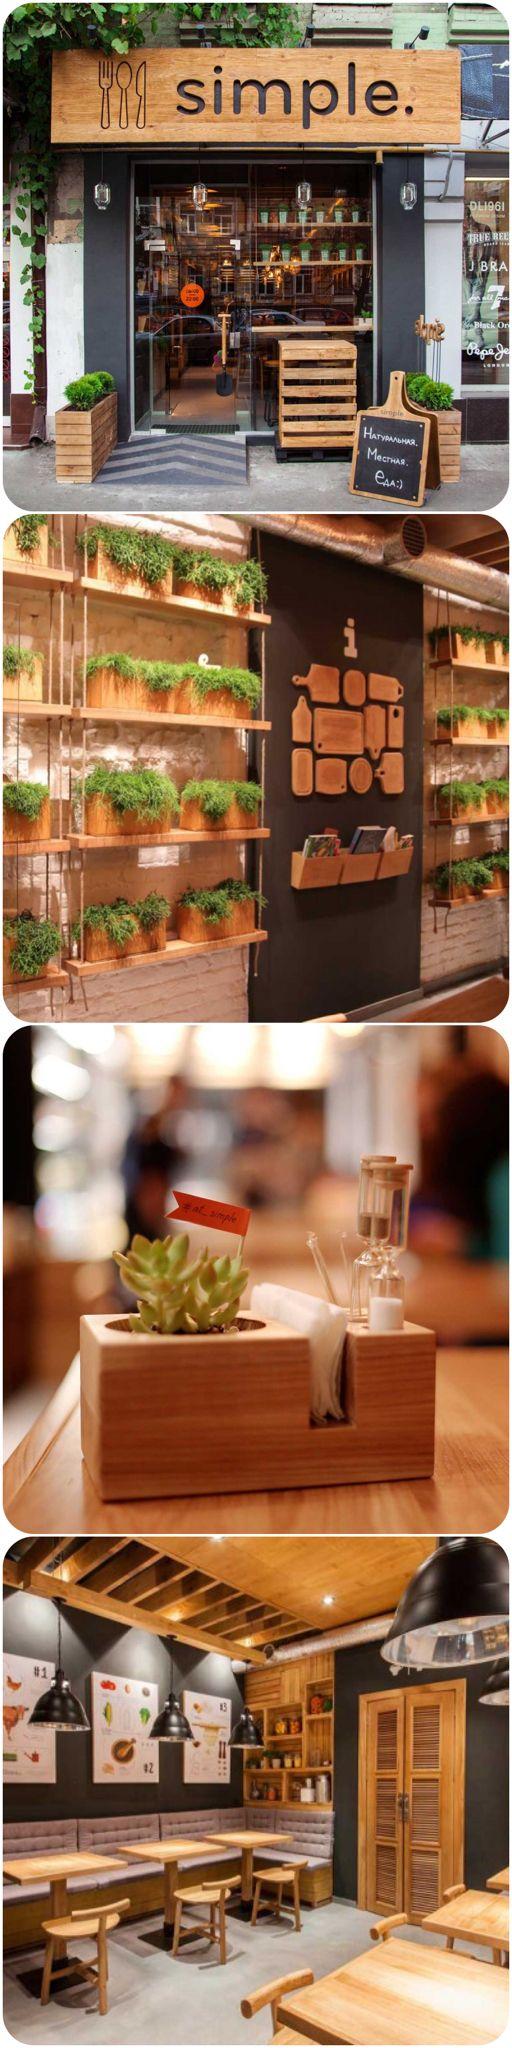 Ideia de horta vertical para temperos hortaliças